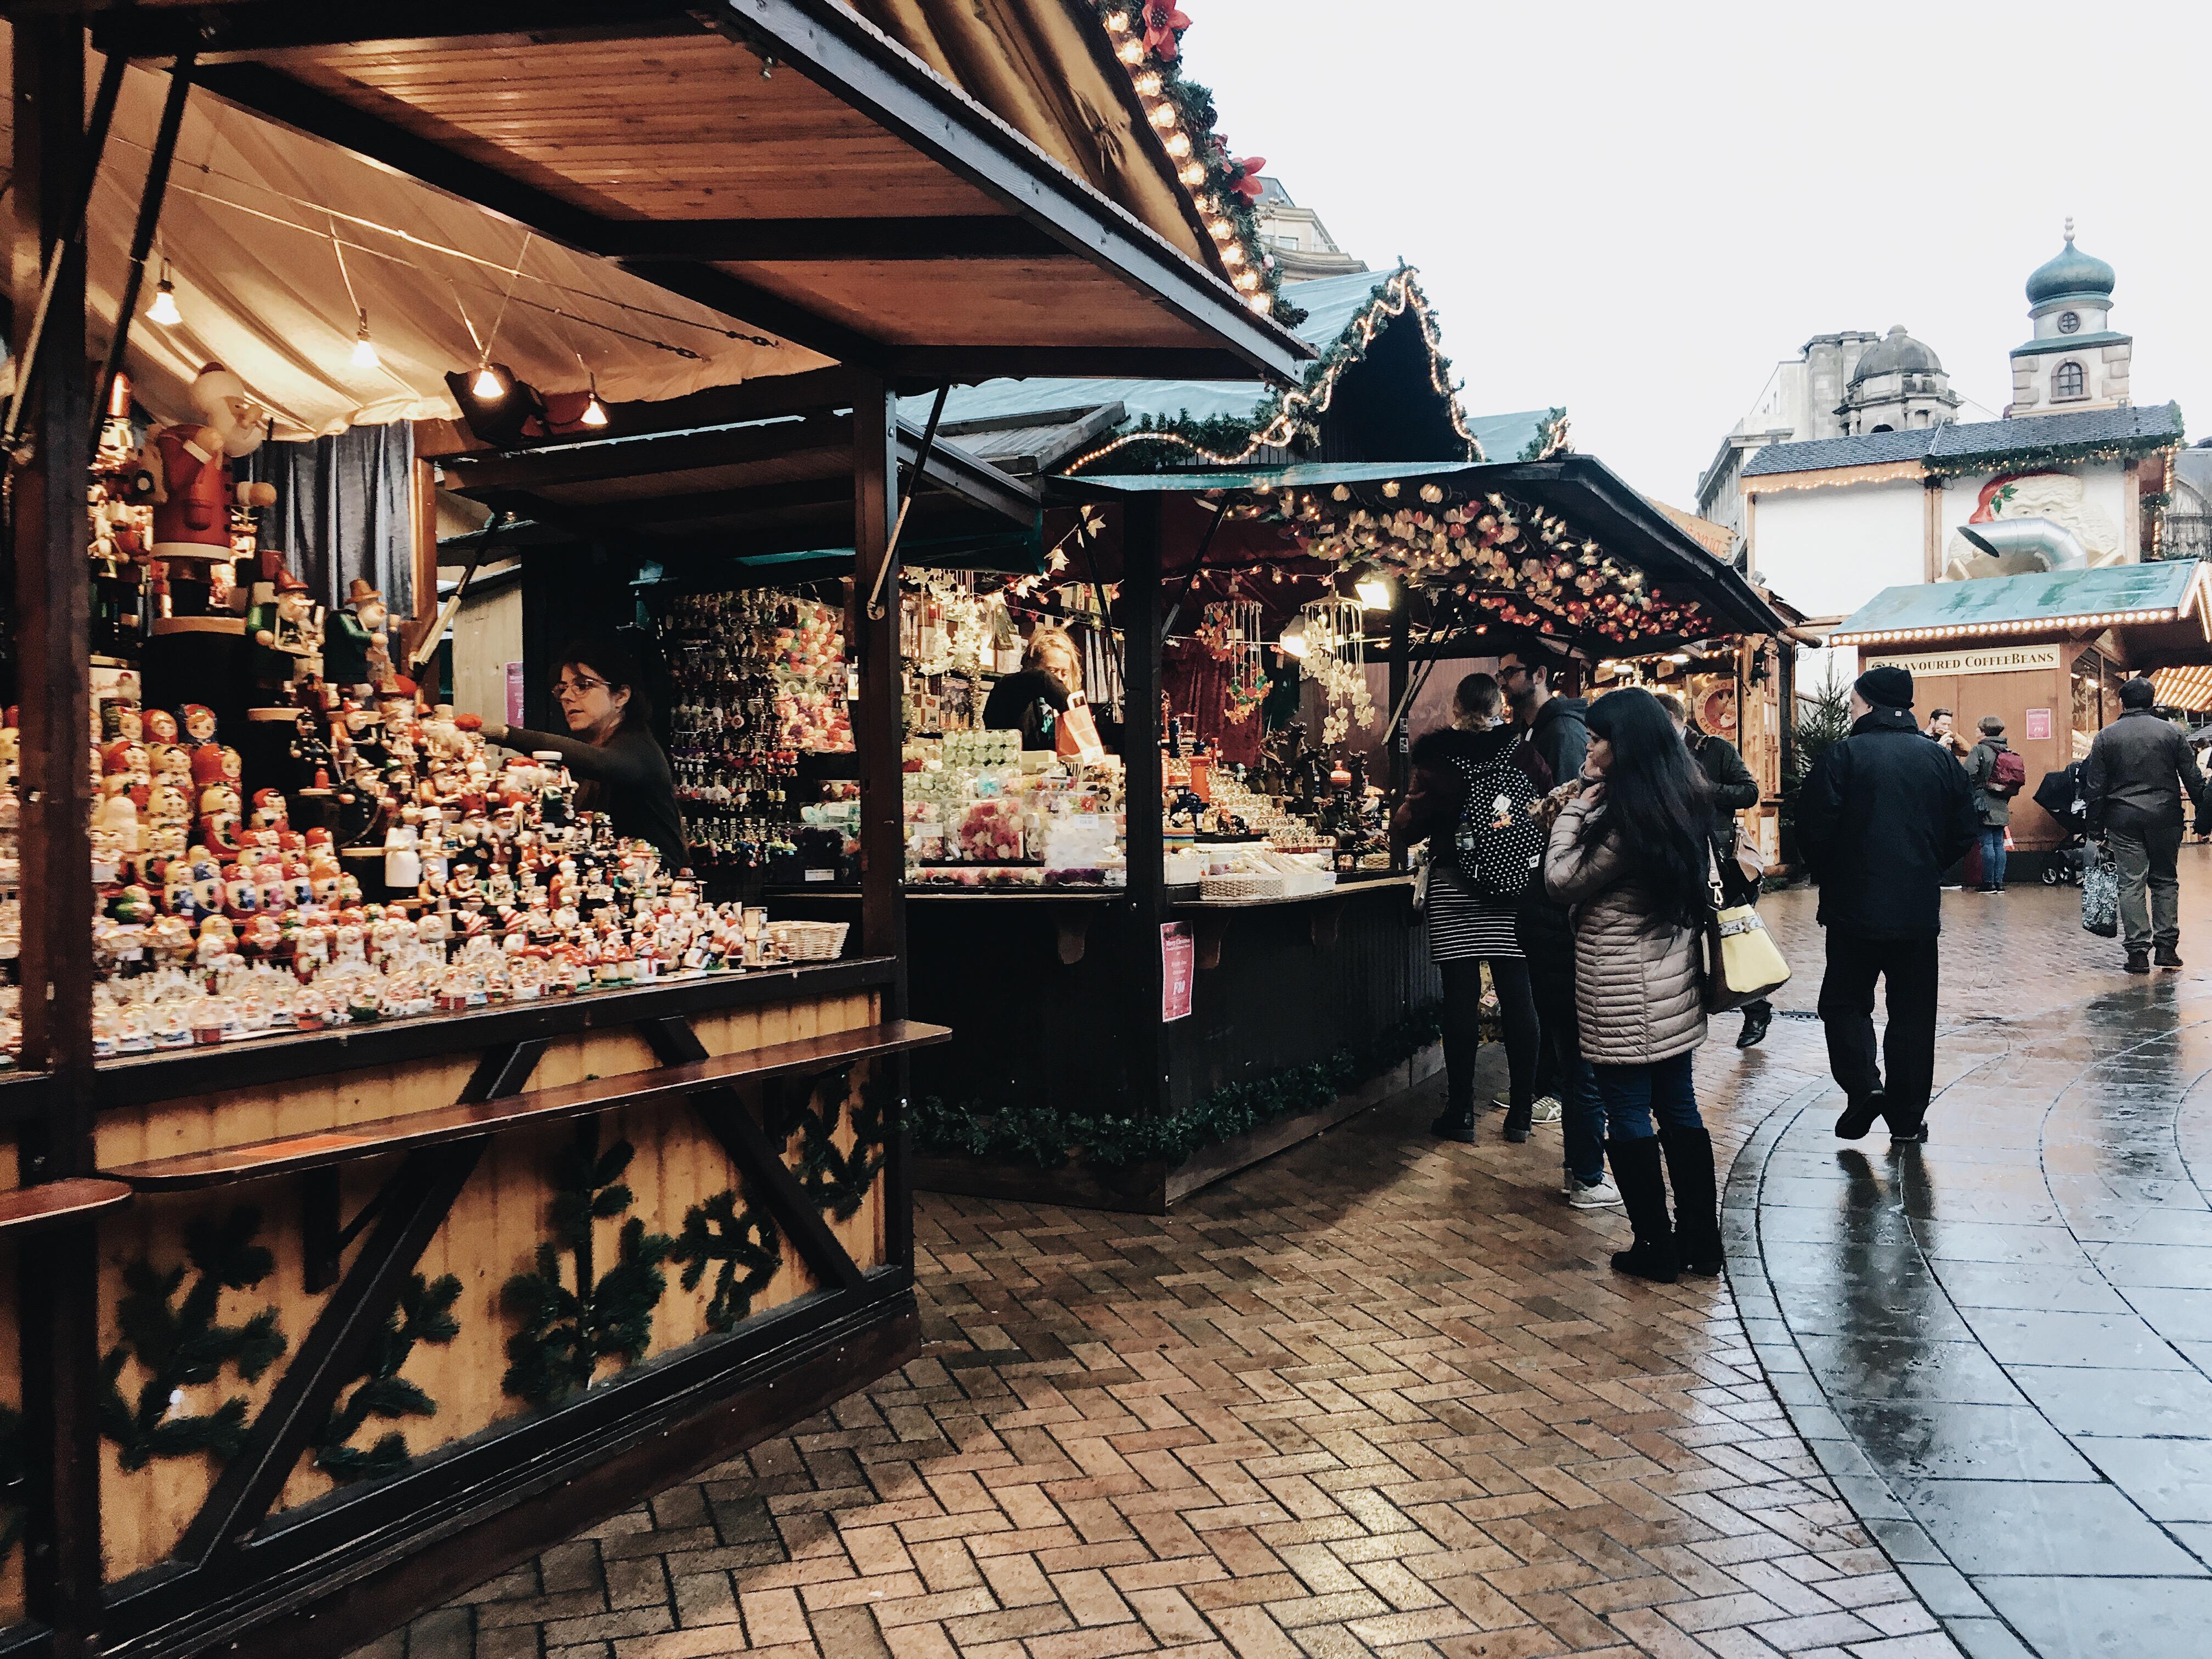 Blogmas Travel Post